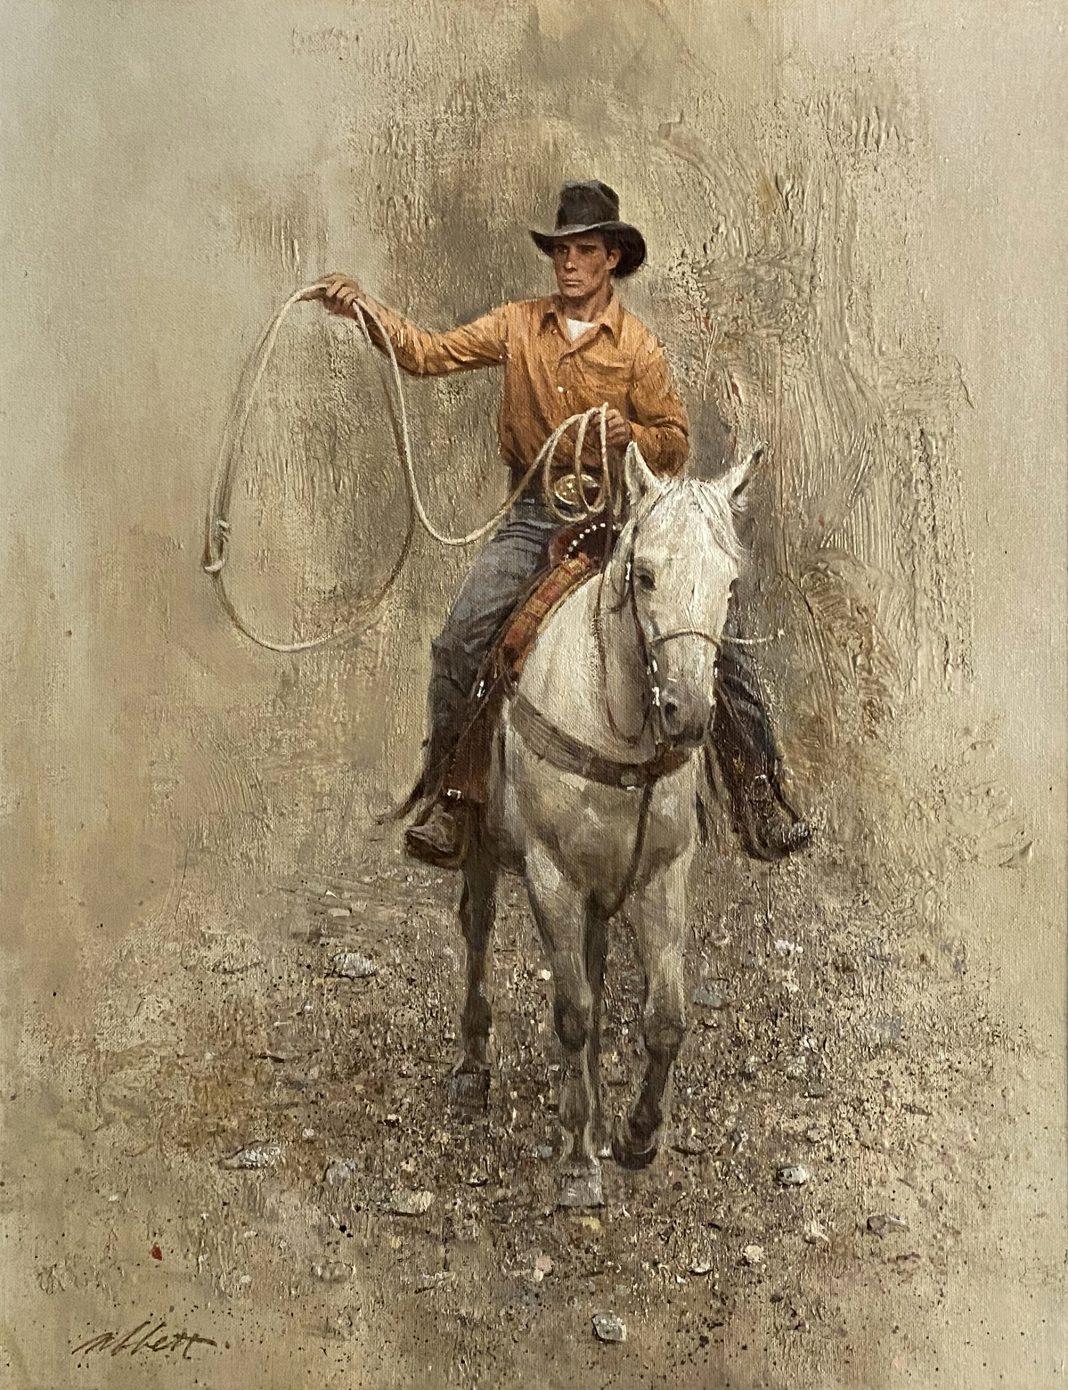 Robert Abbett The Roper cowboy horseback horse roping western oil painting